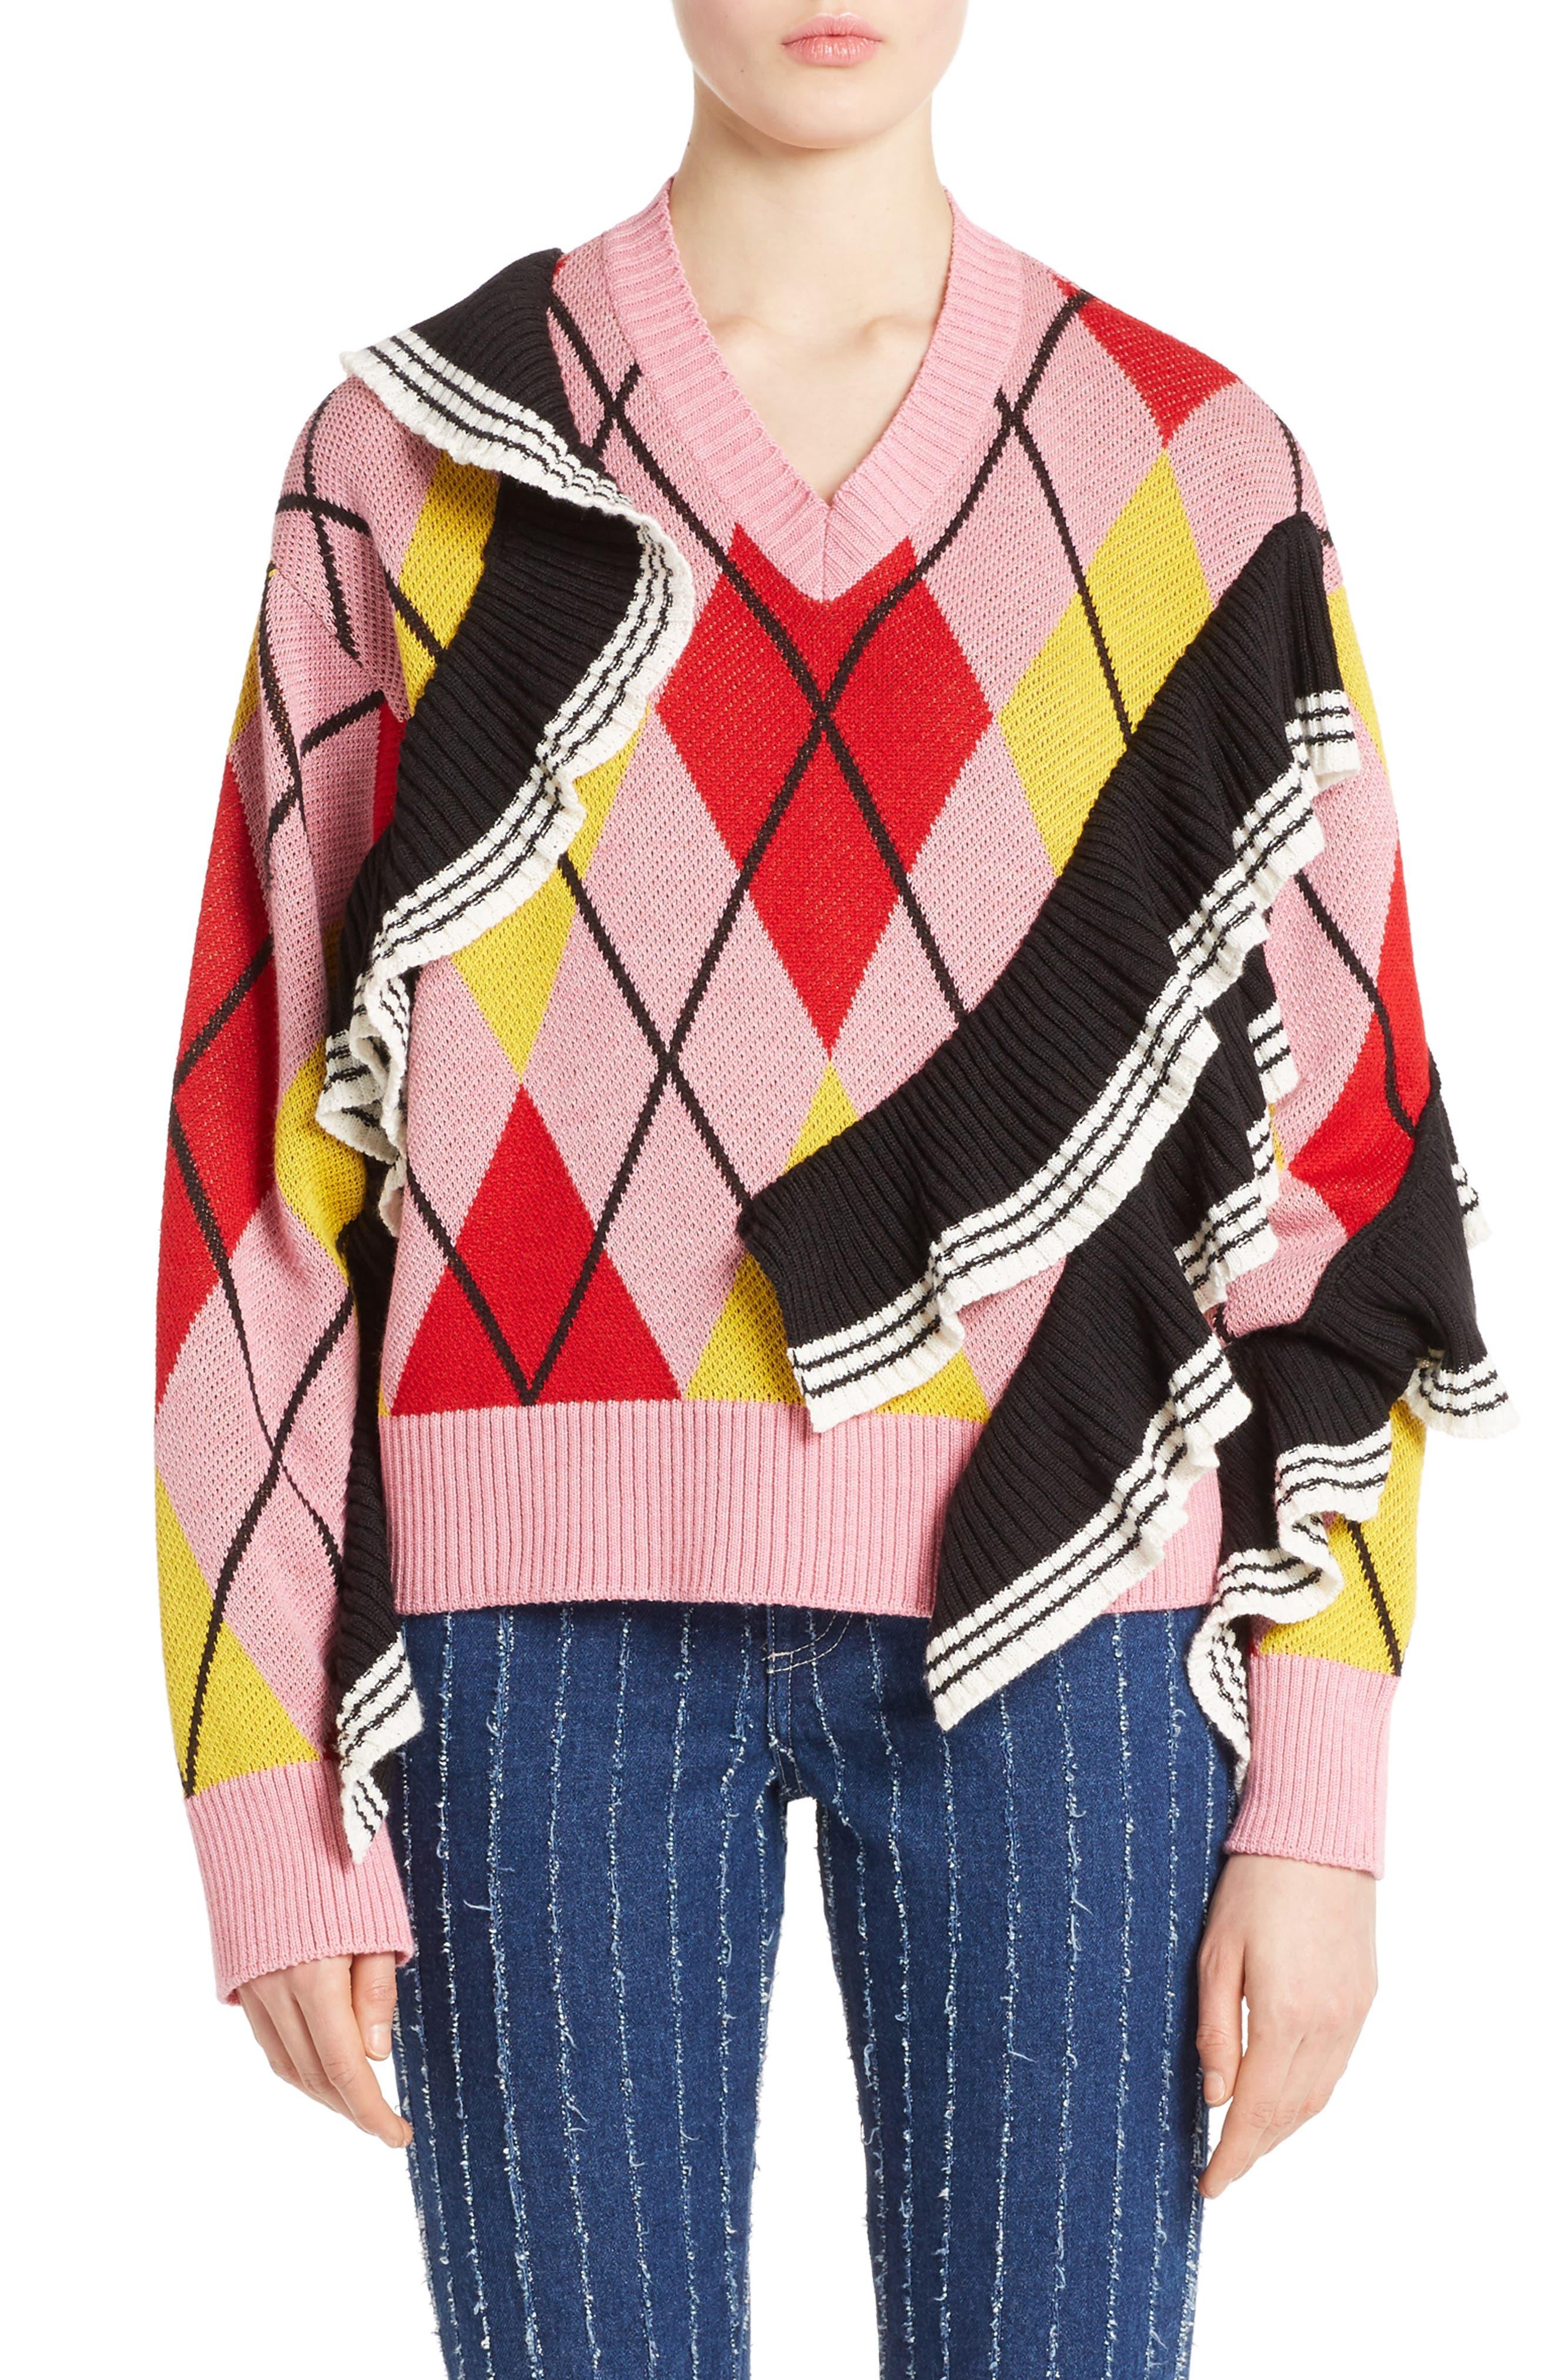 Argyle Ruffle Sweater,                             Main thumbnail 1, color,                             650